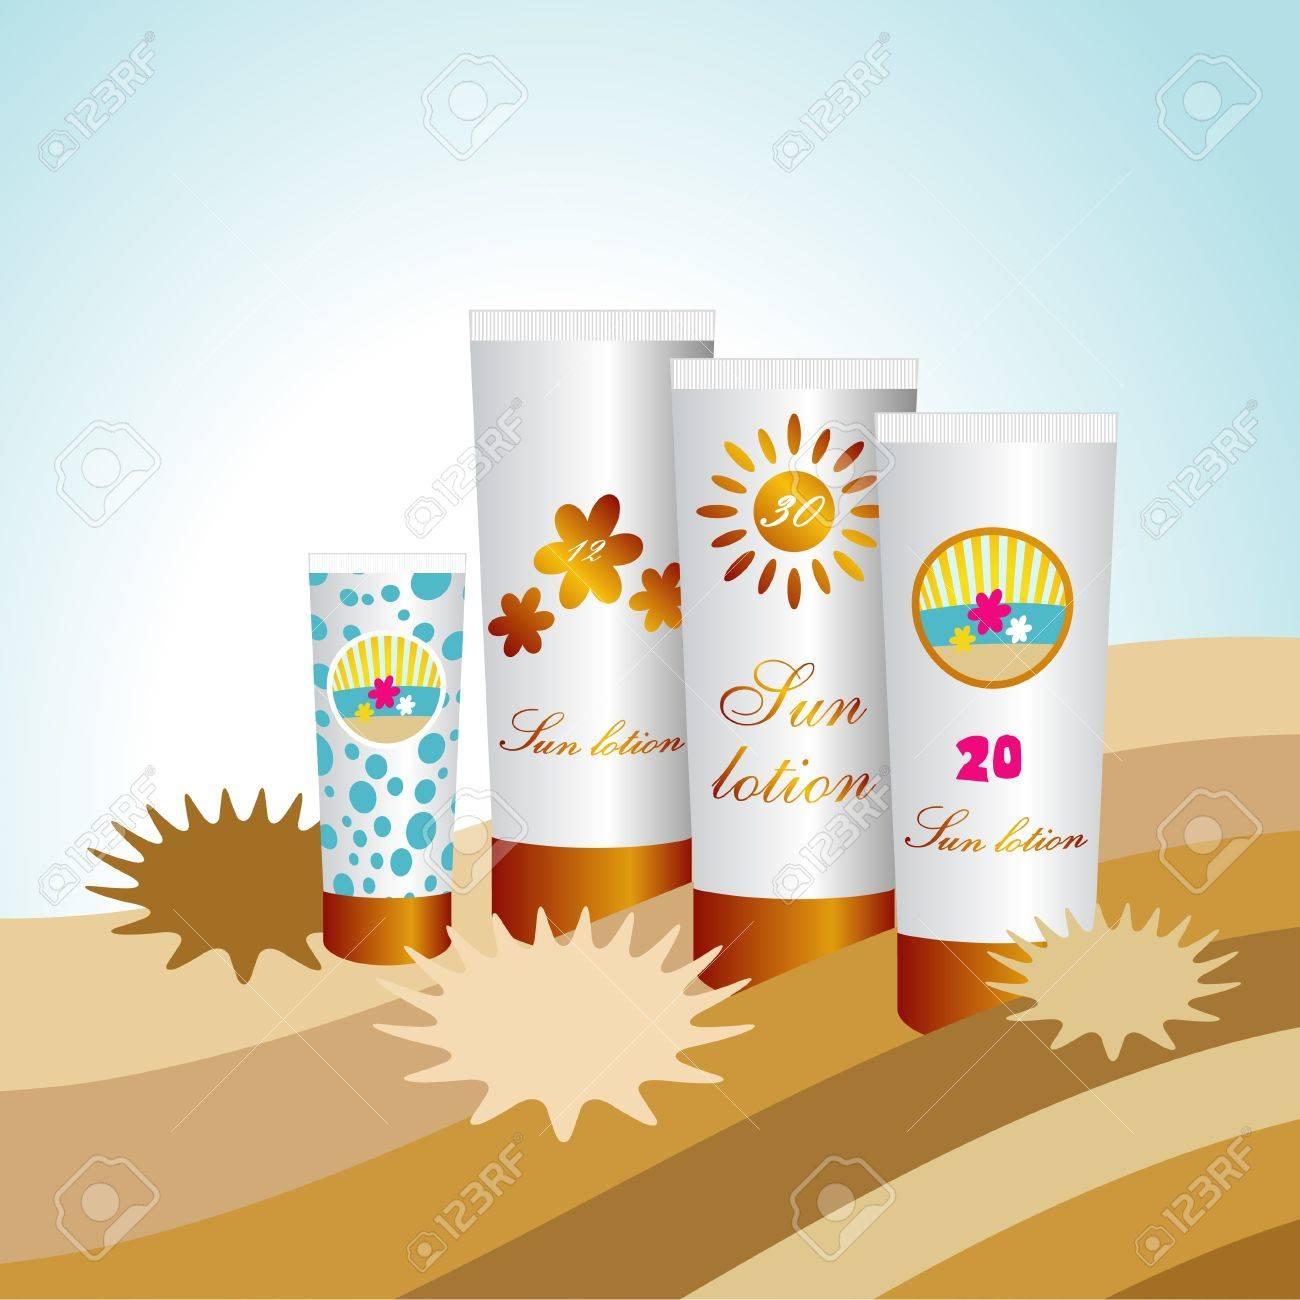 Sunblock lotions. Sun protection skin creams. Stock Vector - 20193811